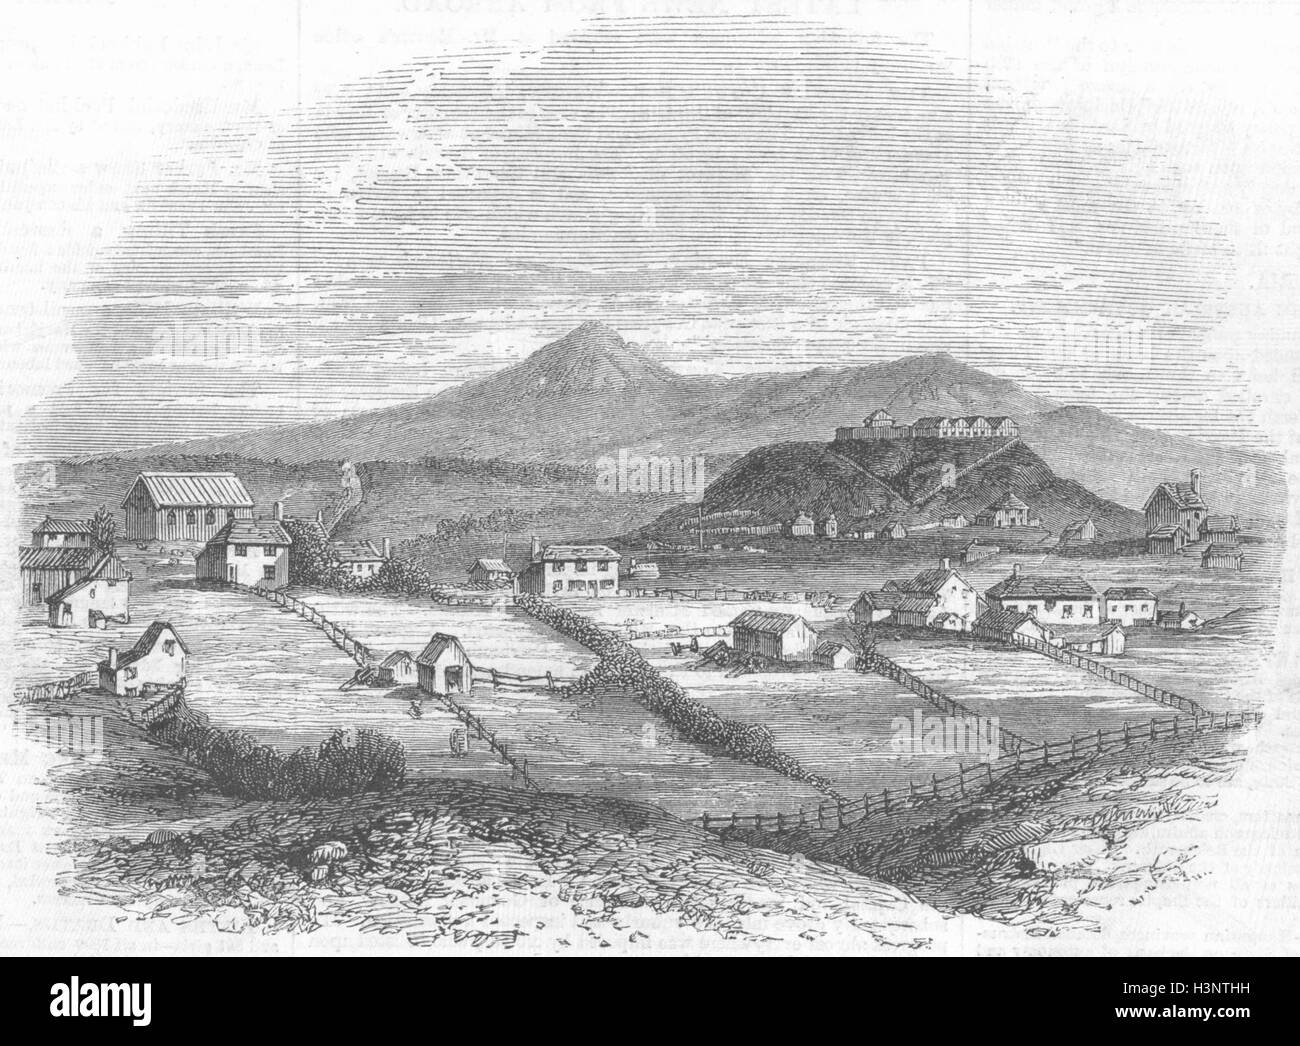 NEW ZEALAND Taranaki(Plymouth)North Island 1860. Illustrated London News - Stock Image